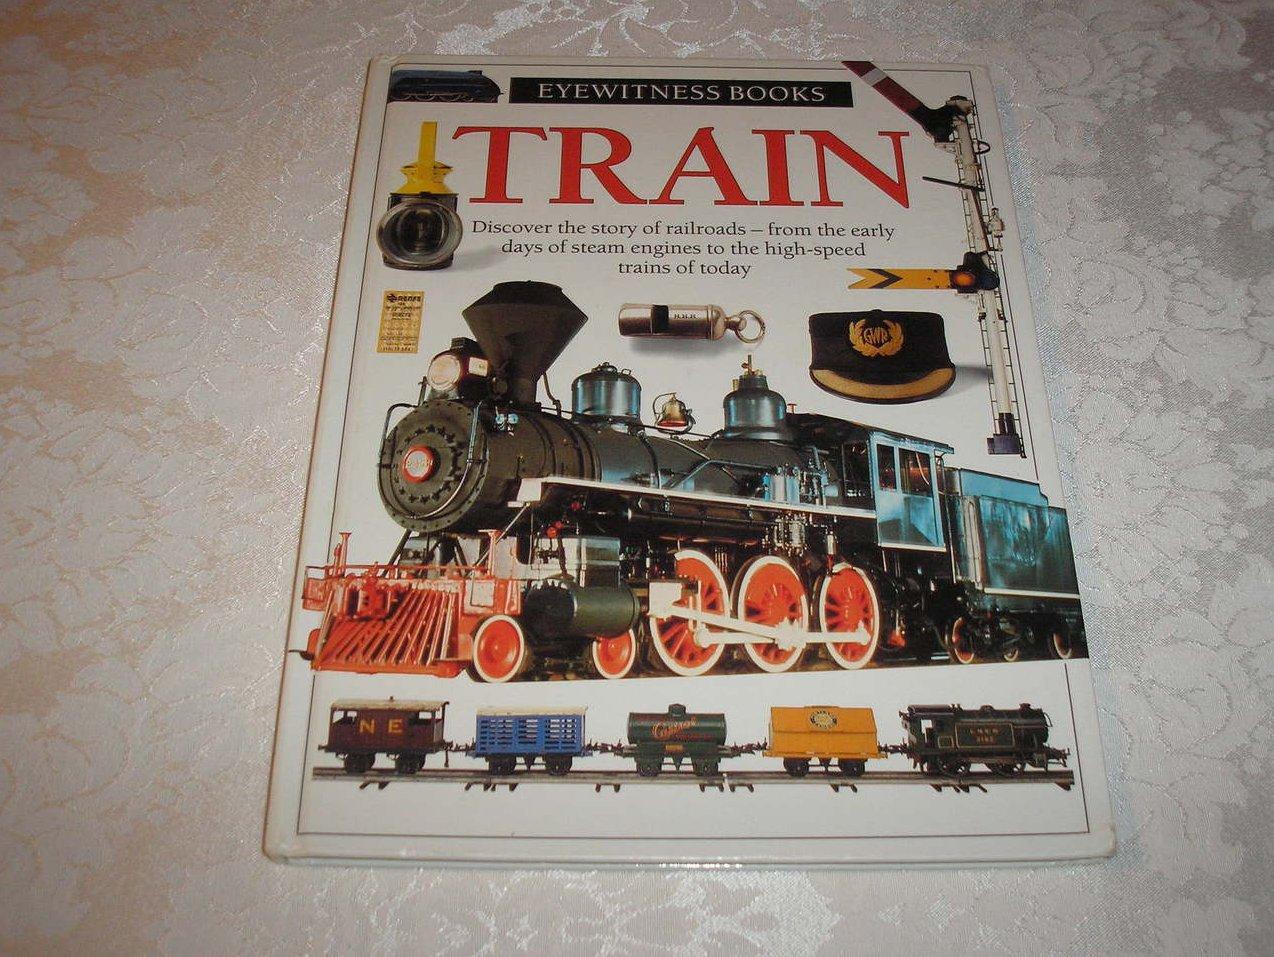 Eyewitness Books Train good hc